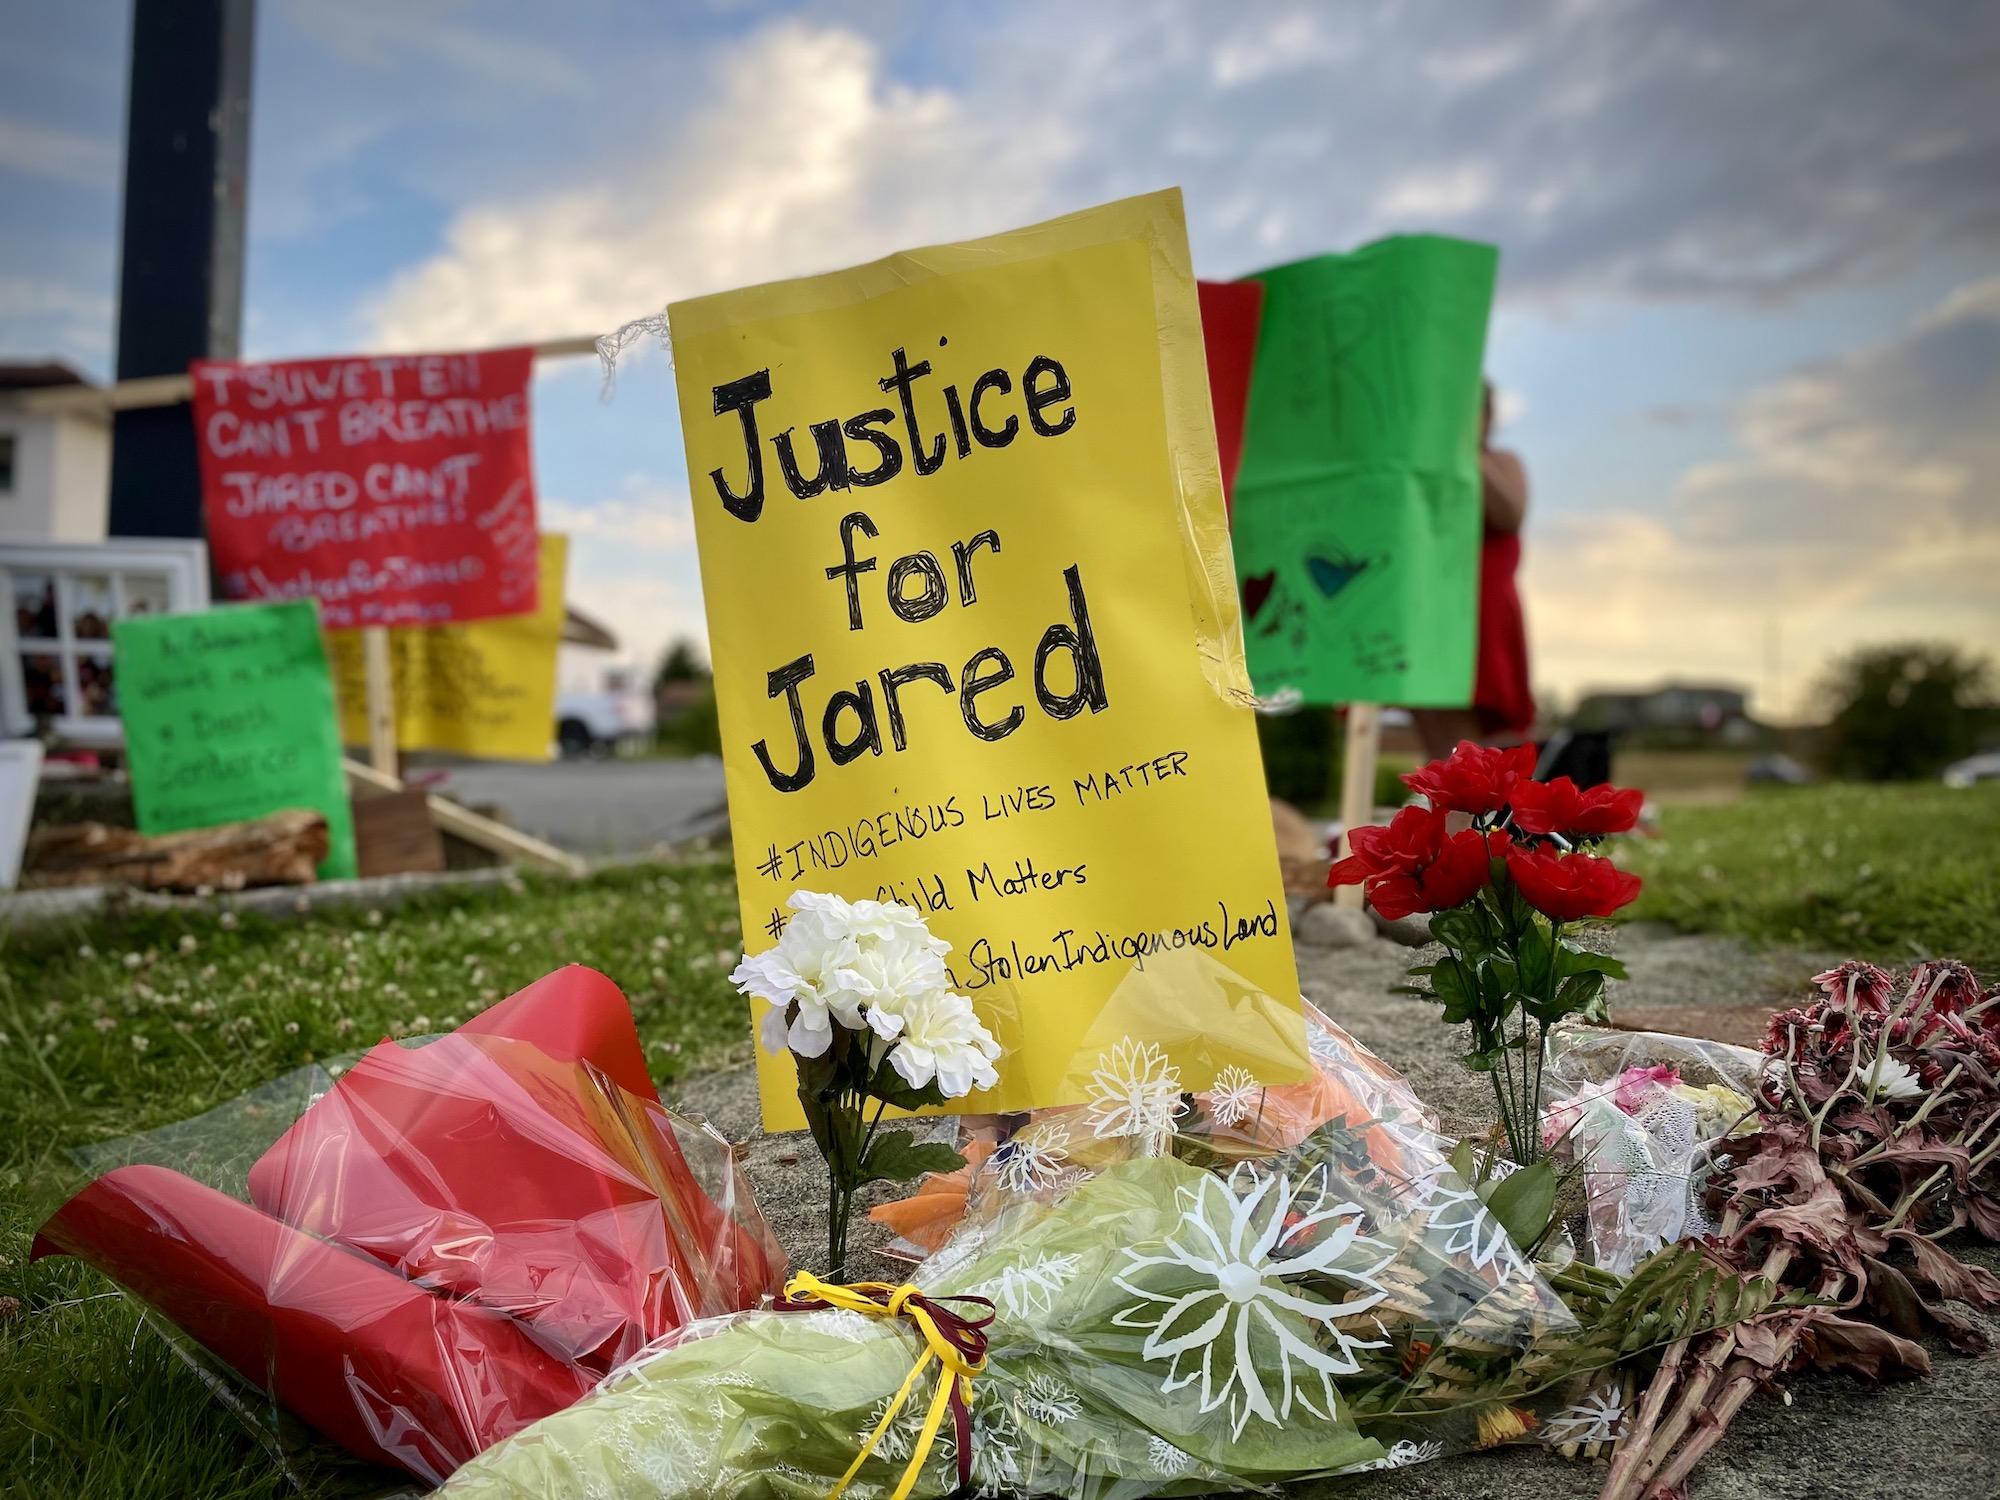 'An arrest warrant should not be a death sentence'